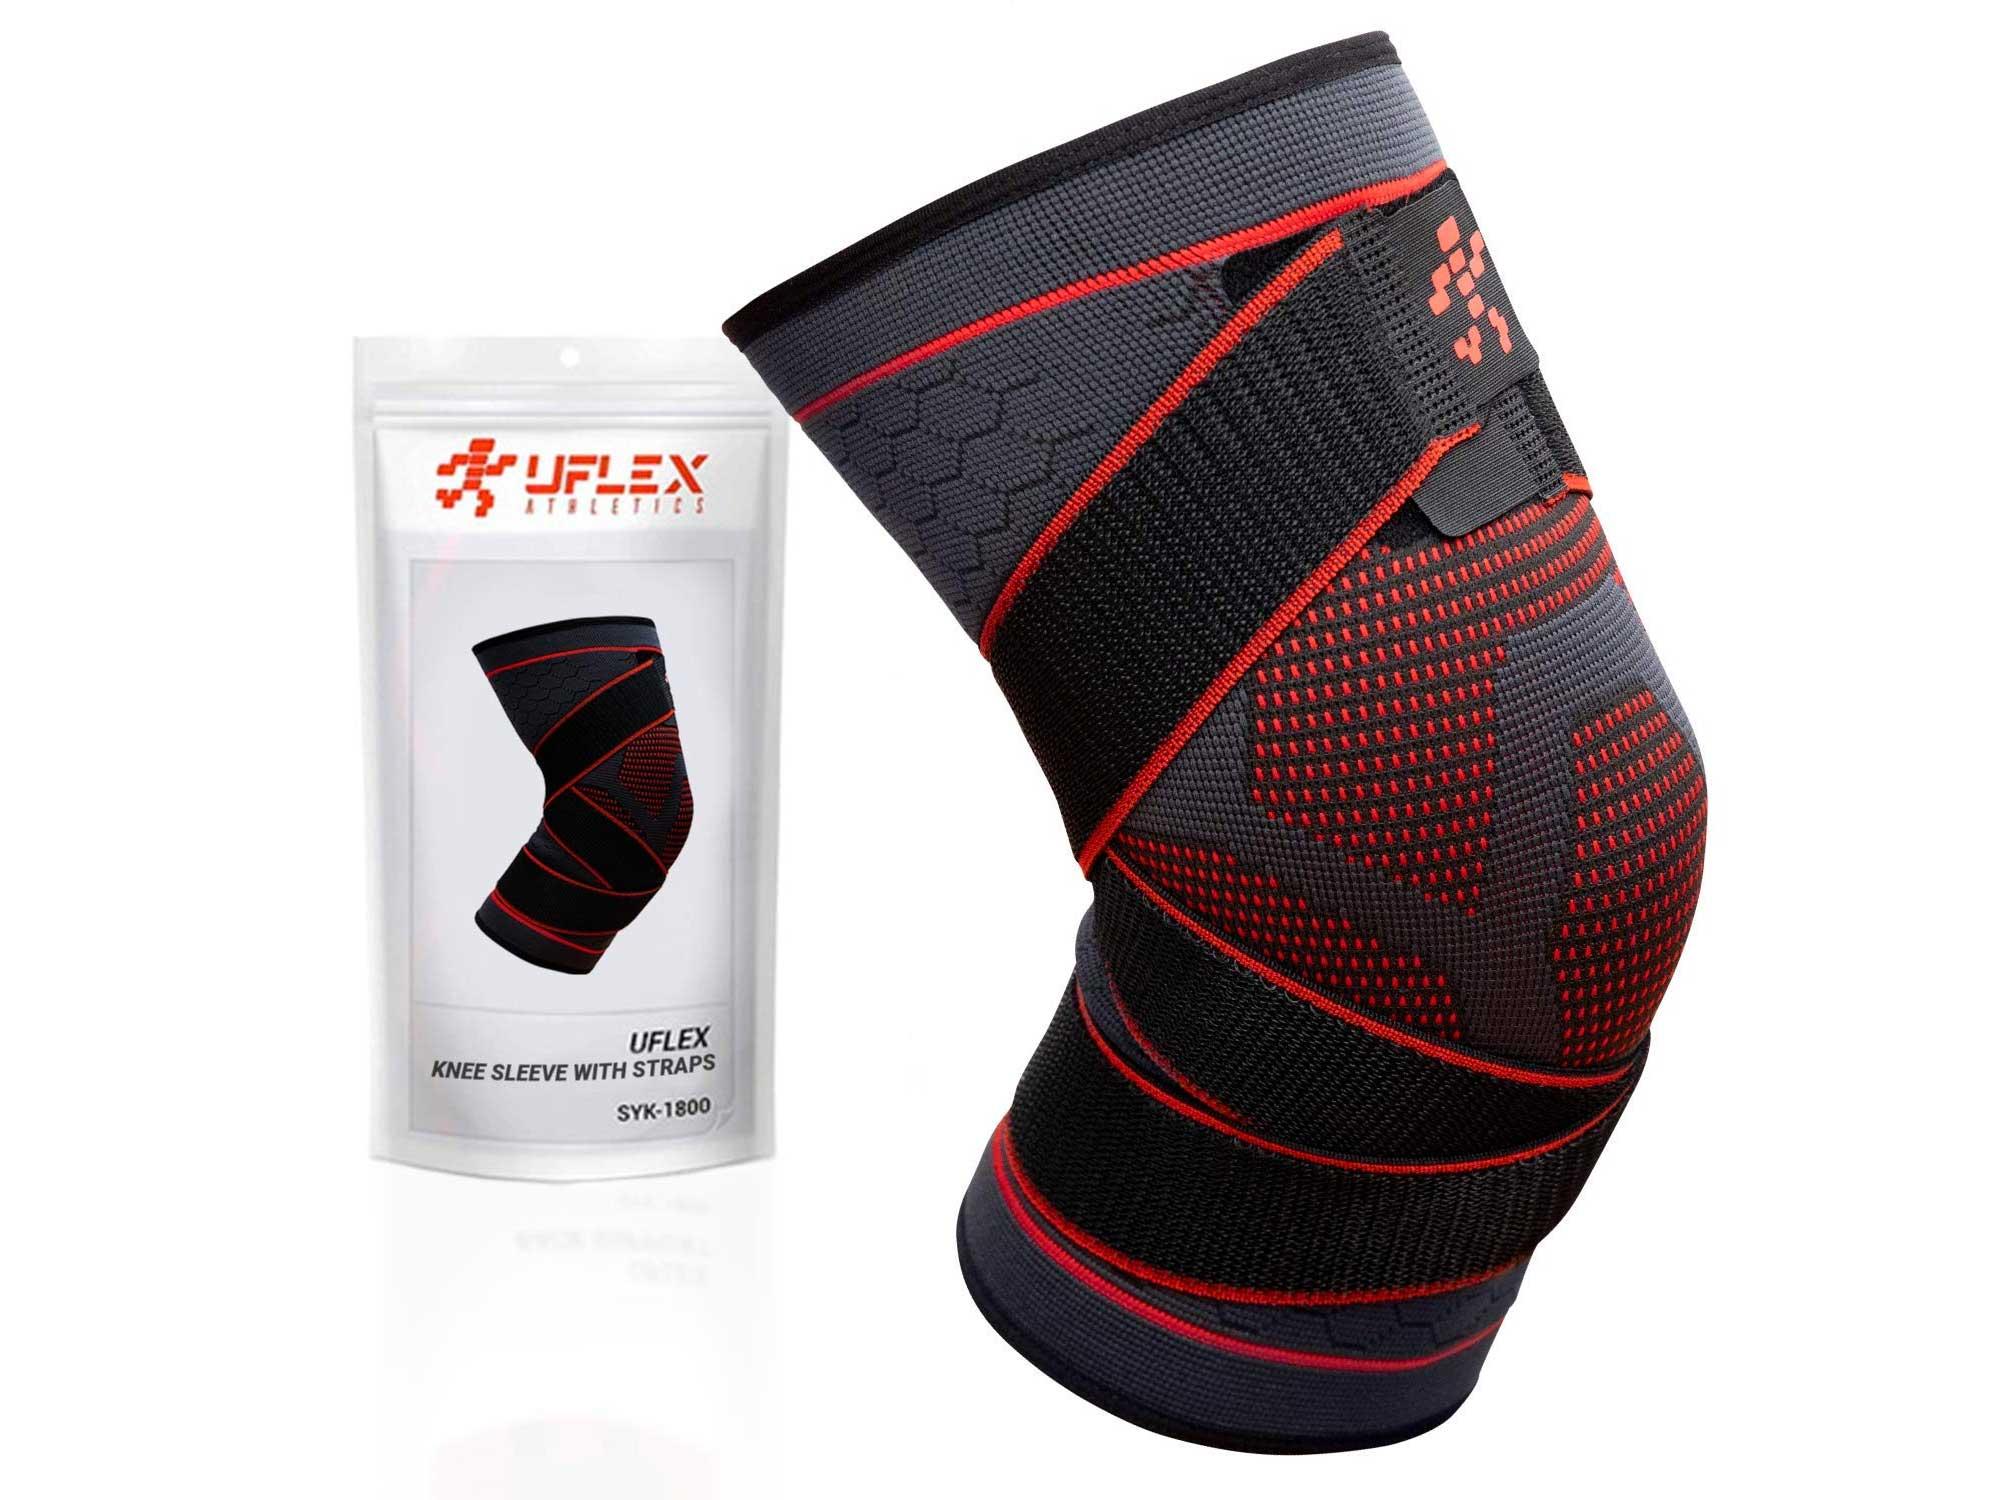 UFlex knee brace